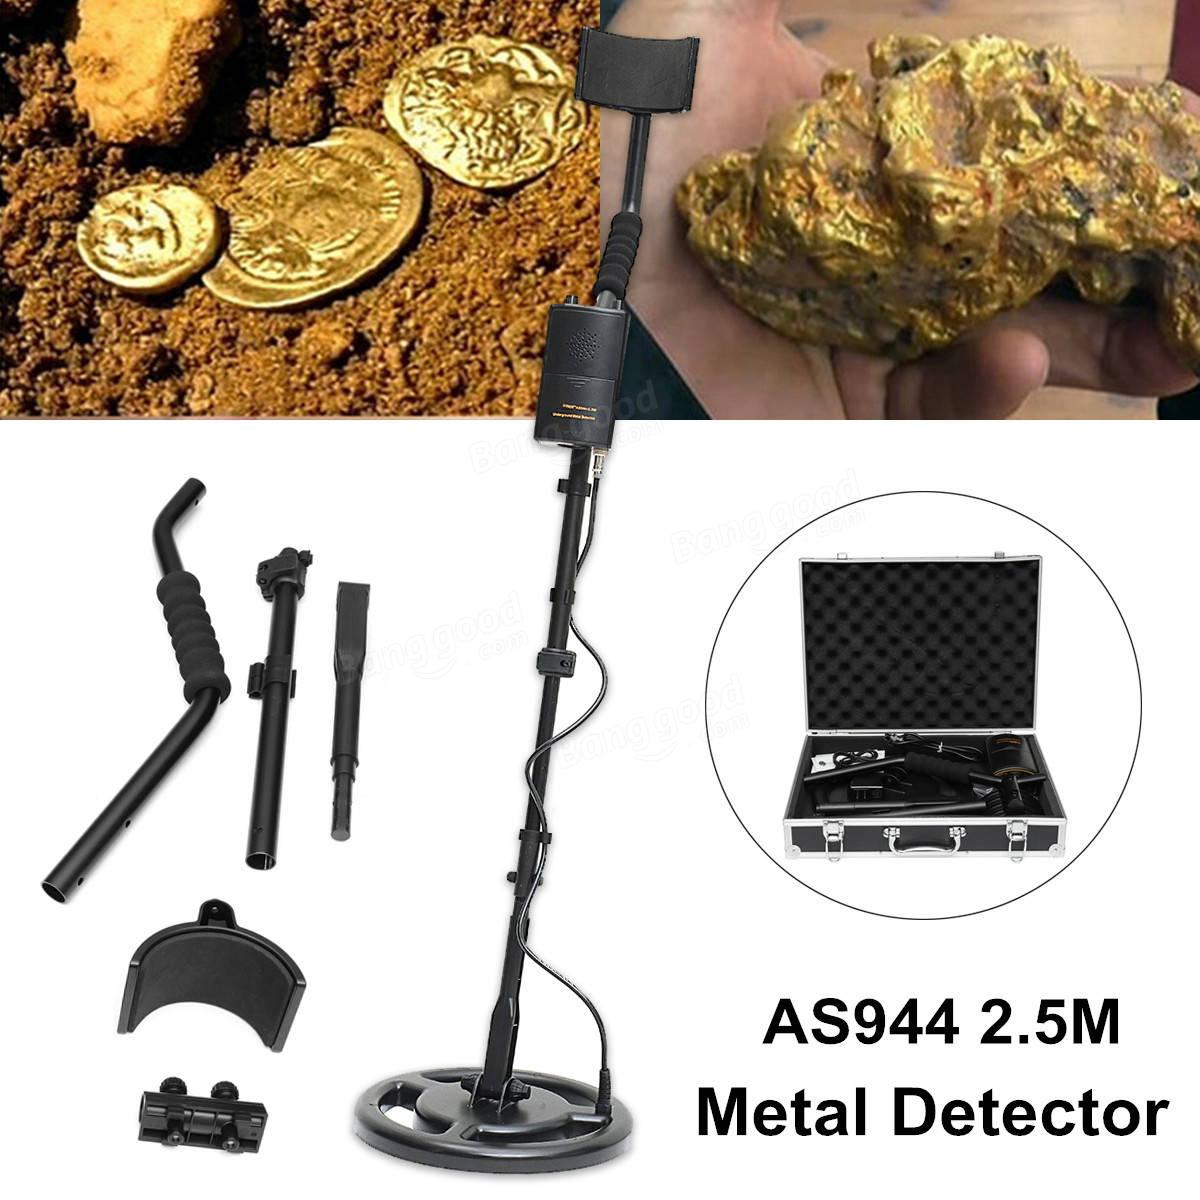 AS944 2.5M Silver Metal Detector Underground Gold Digger Treasure ...